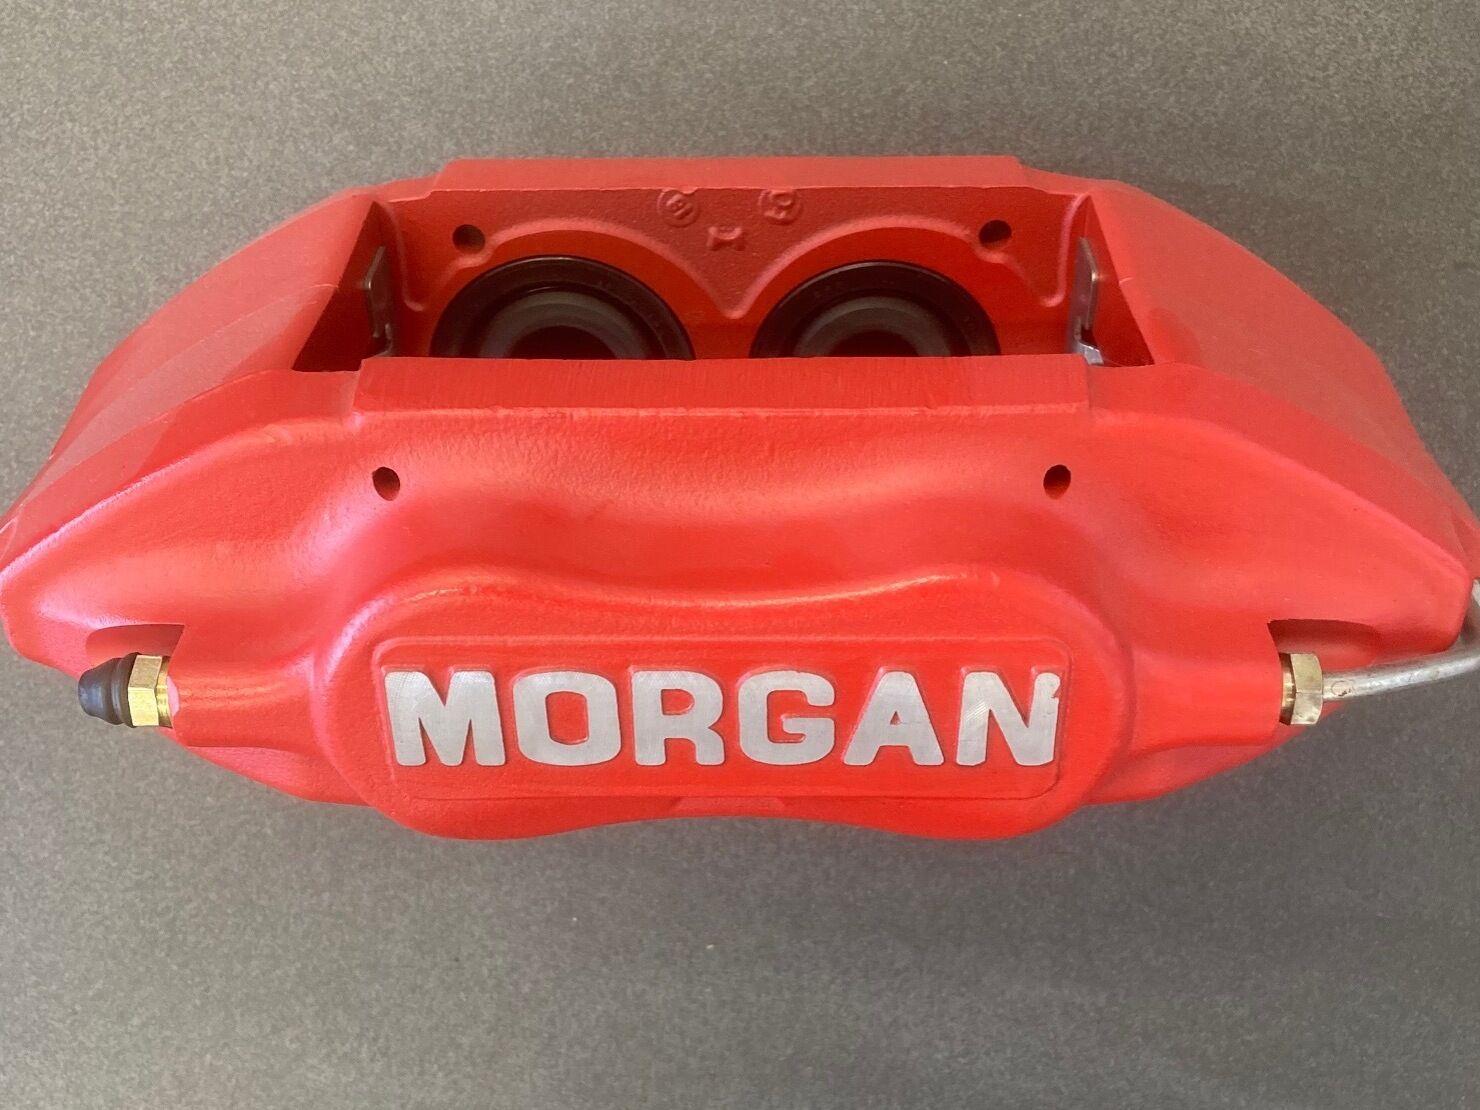 Morgan AP Racing Aero 8 Brake Calipers - per pair